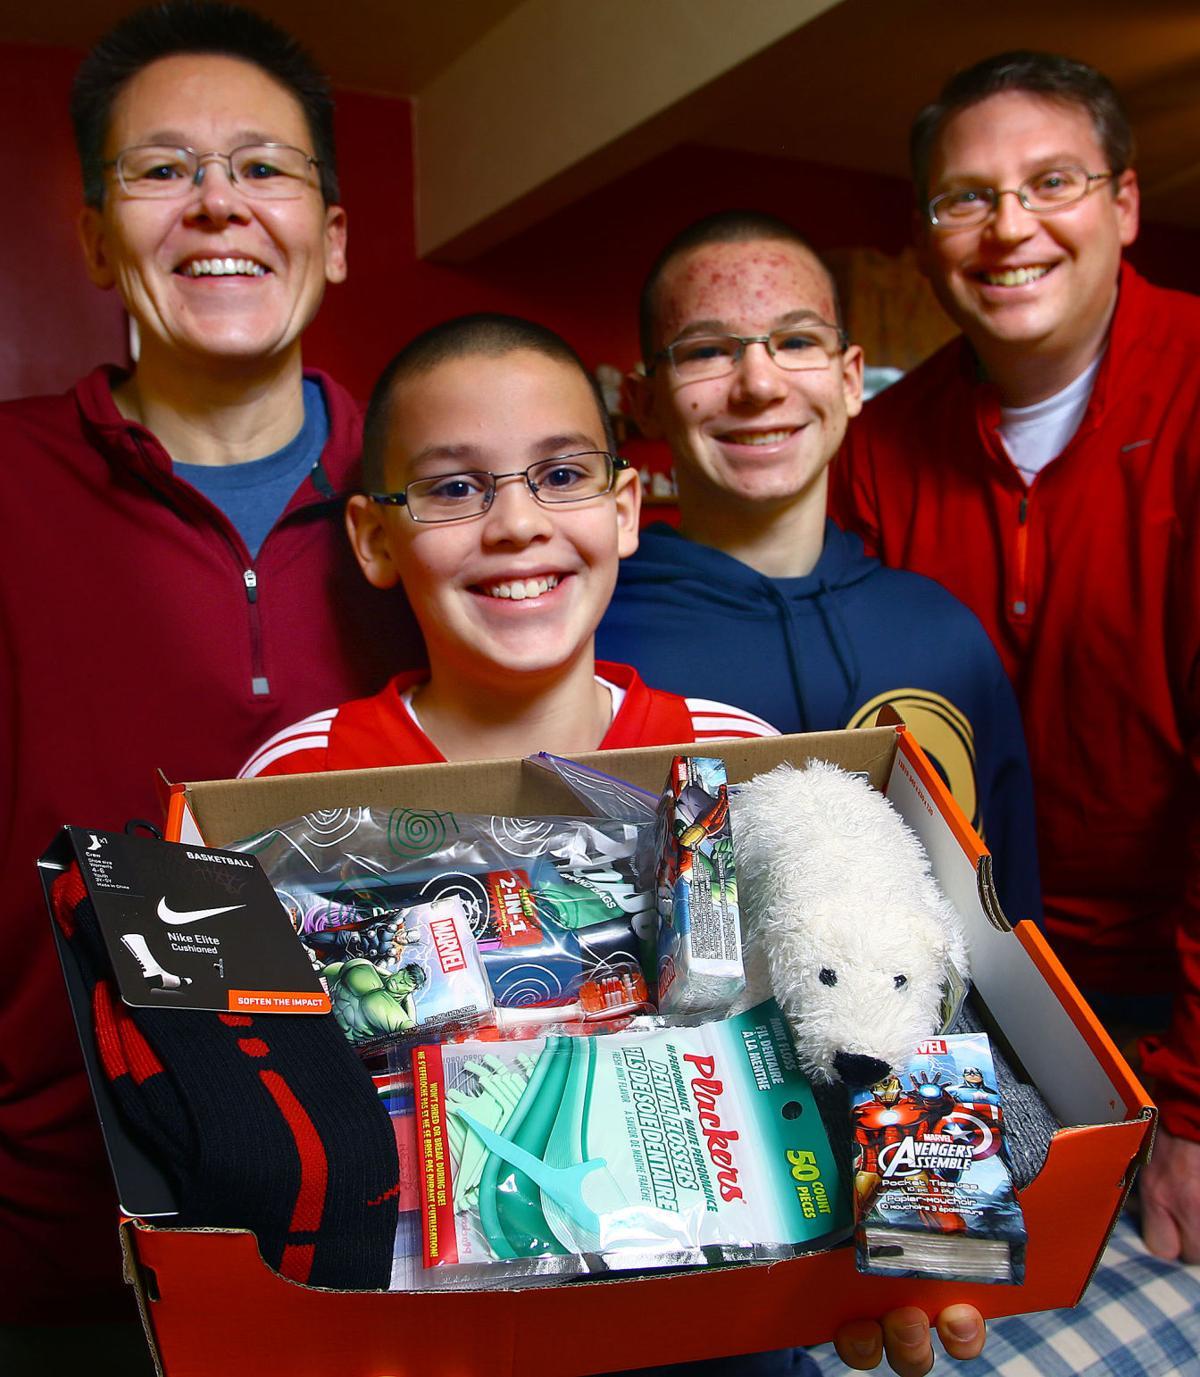 Christmas Shoebox Project 2021 Kokomo Boy Starts Christmas In A Shoebox Project To Help Peers News Kokomotribune Com